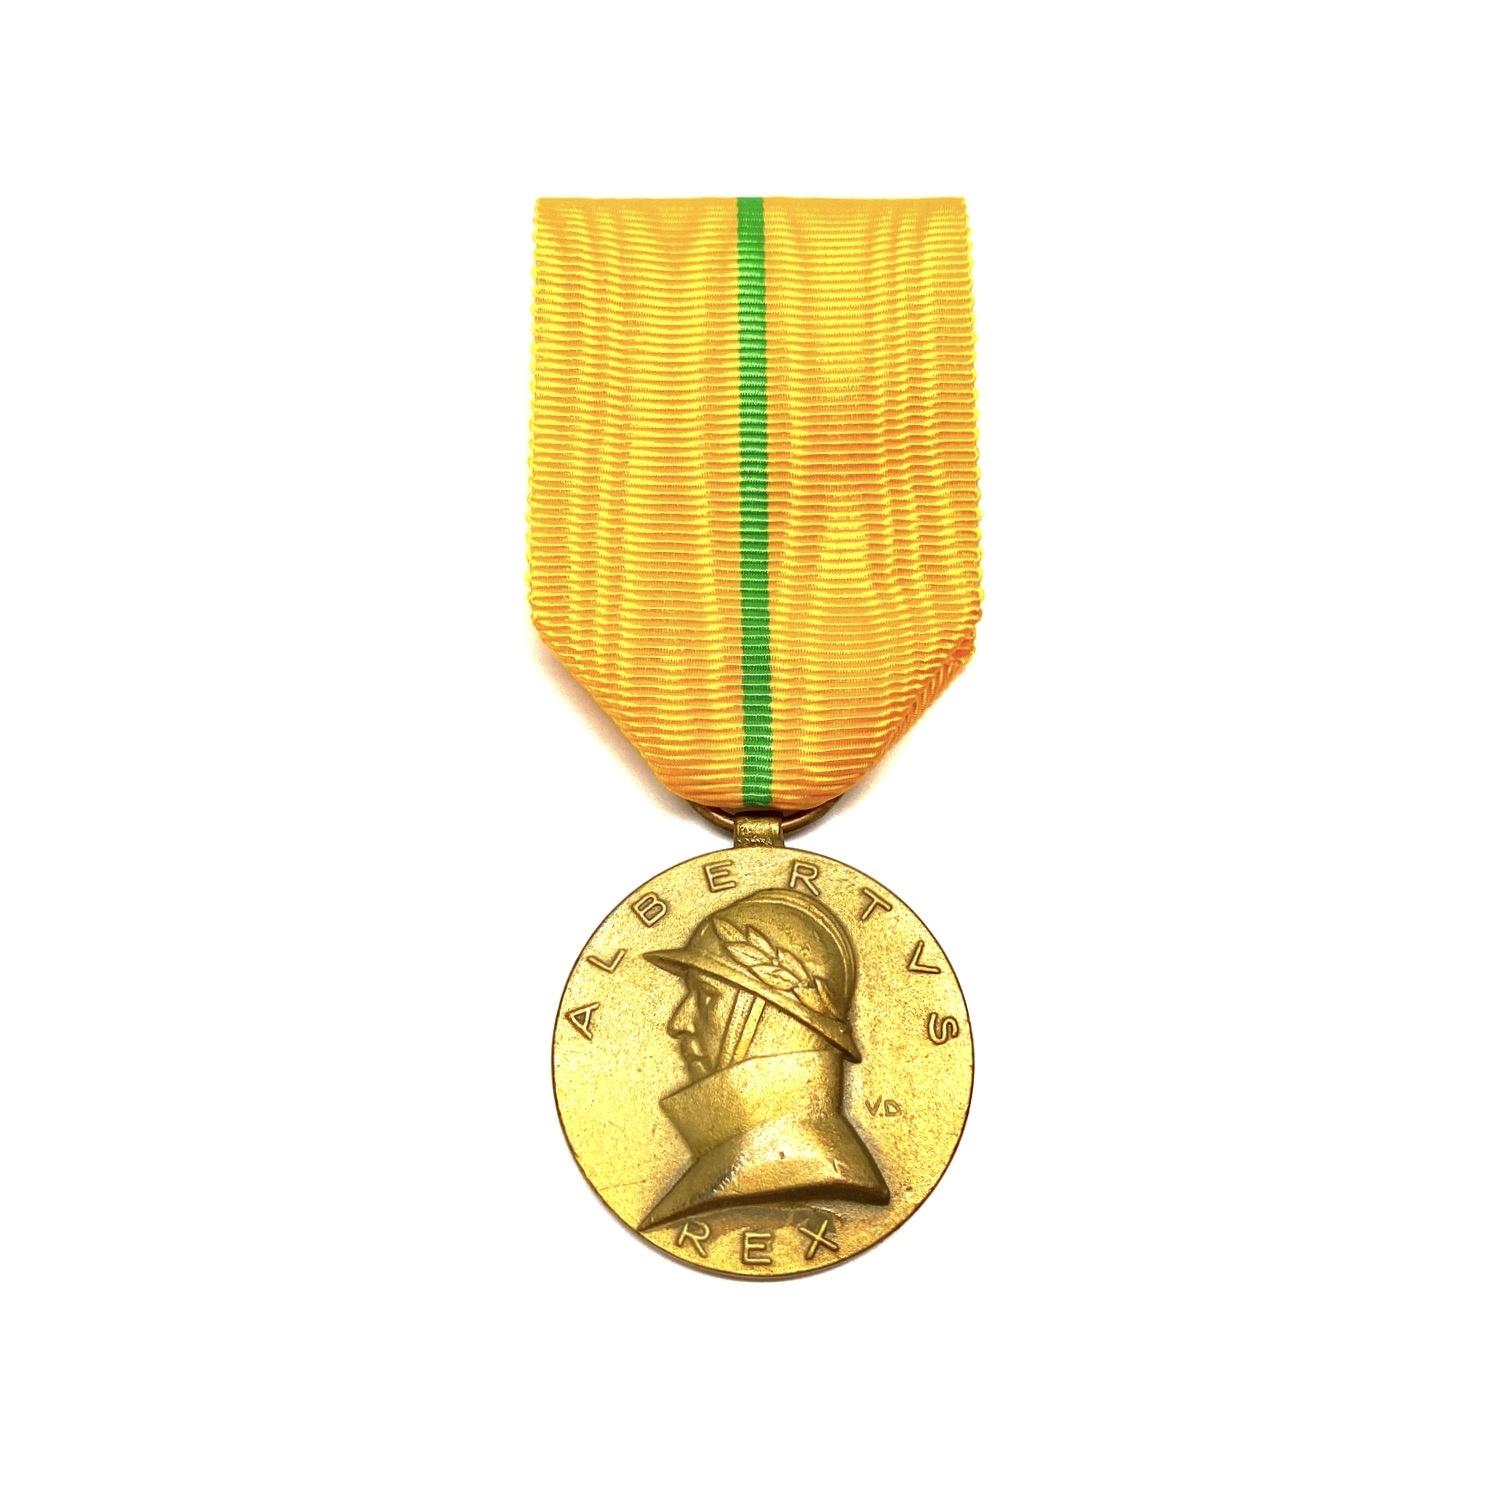 Commemorative medal Albert I